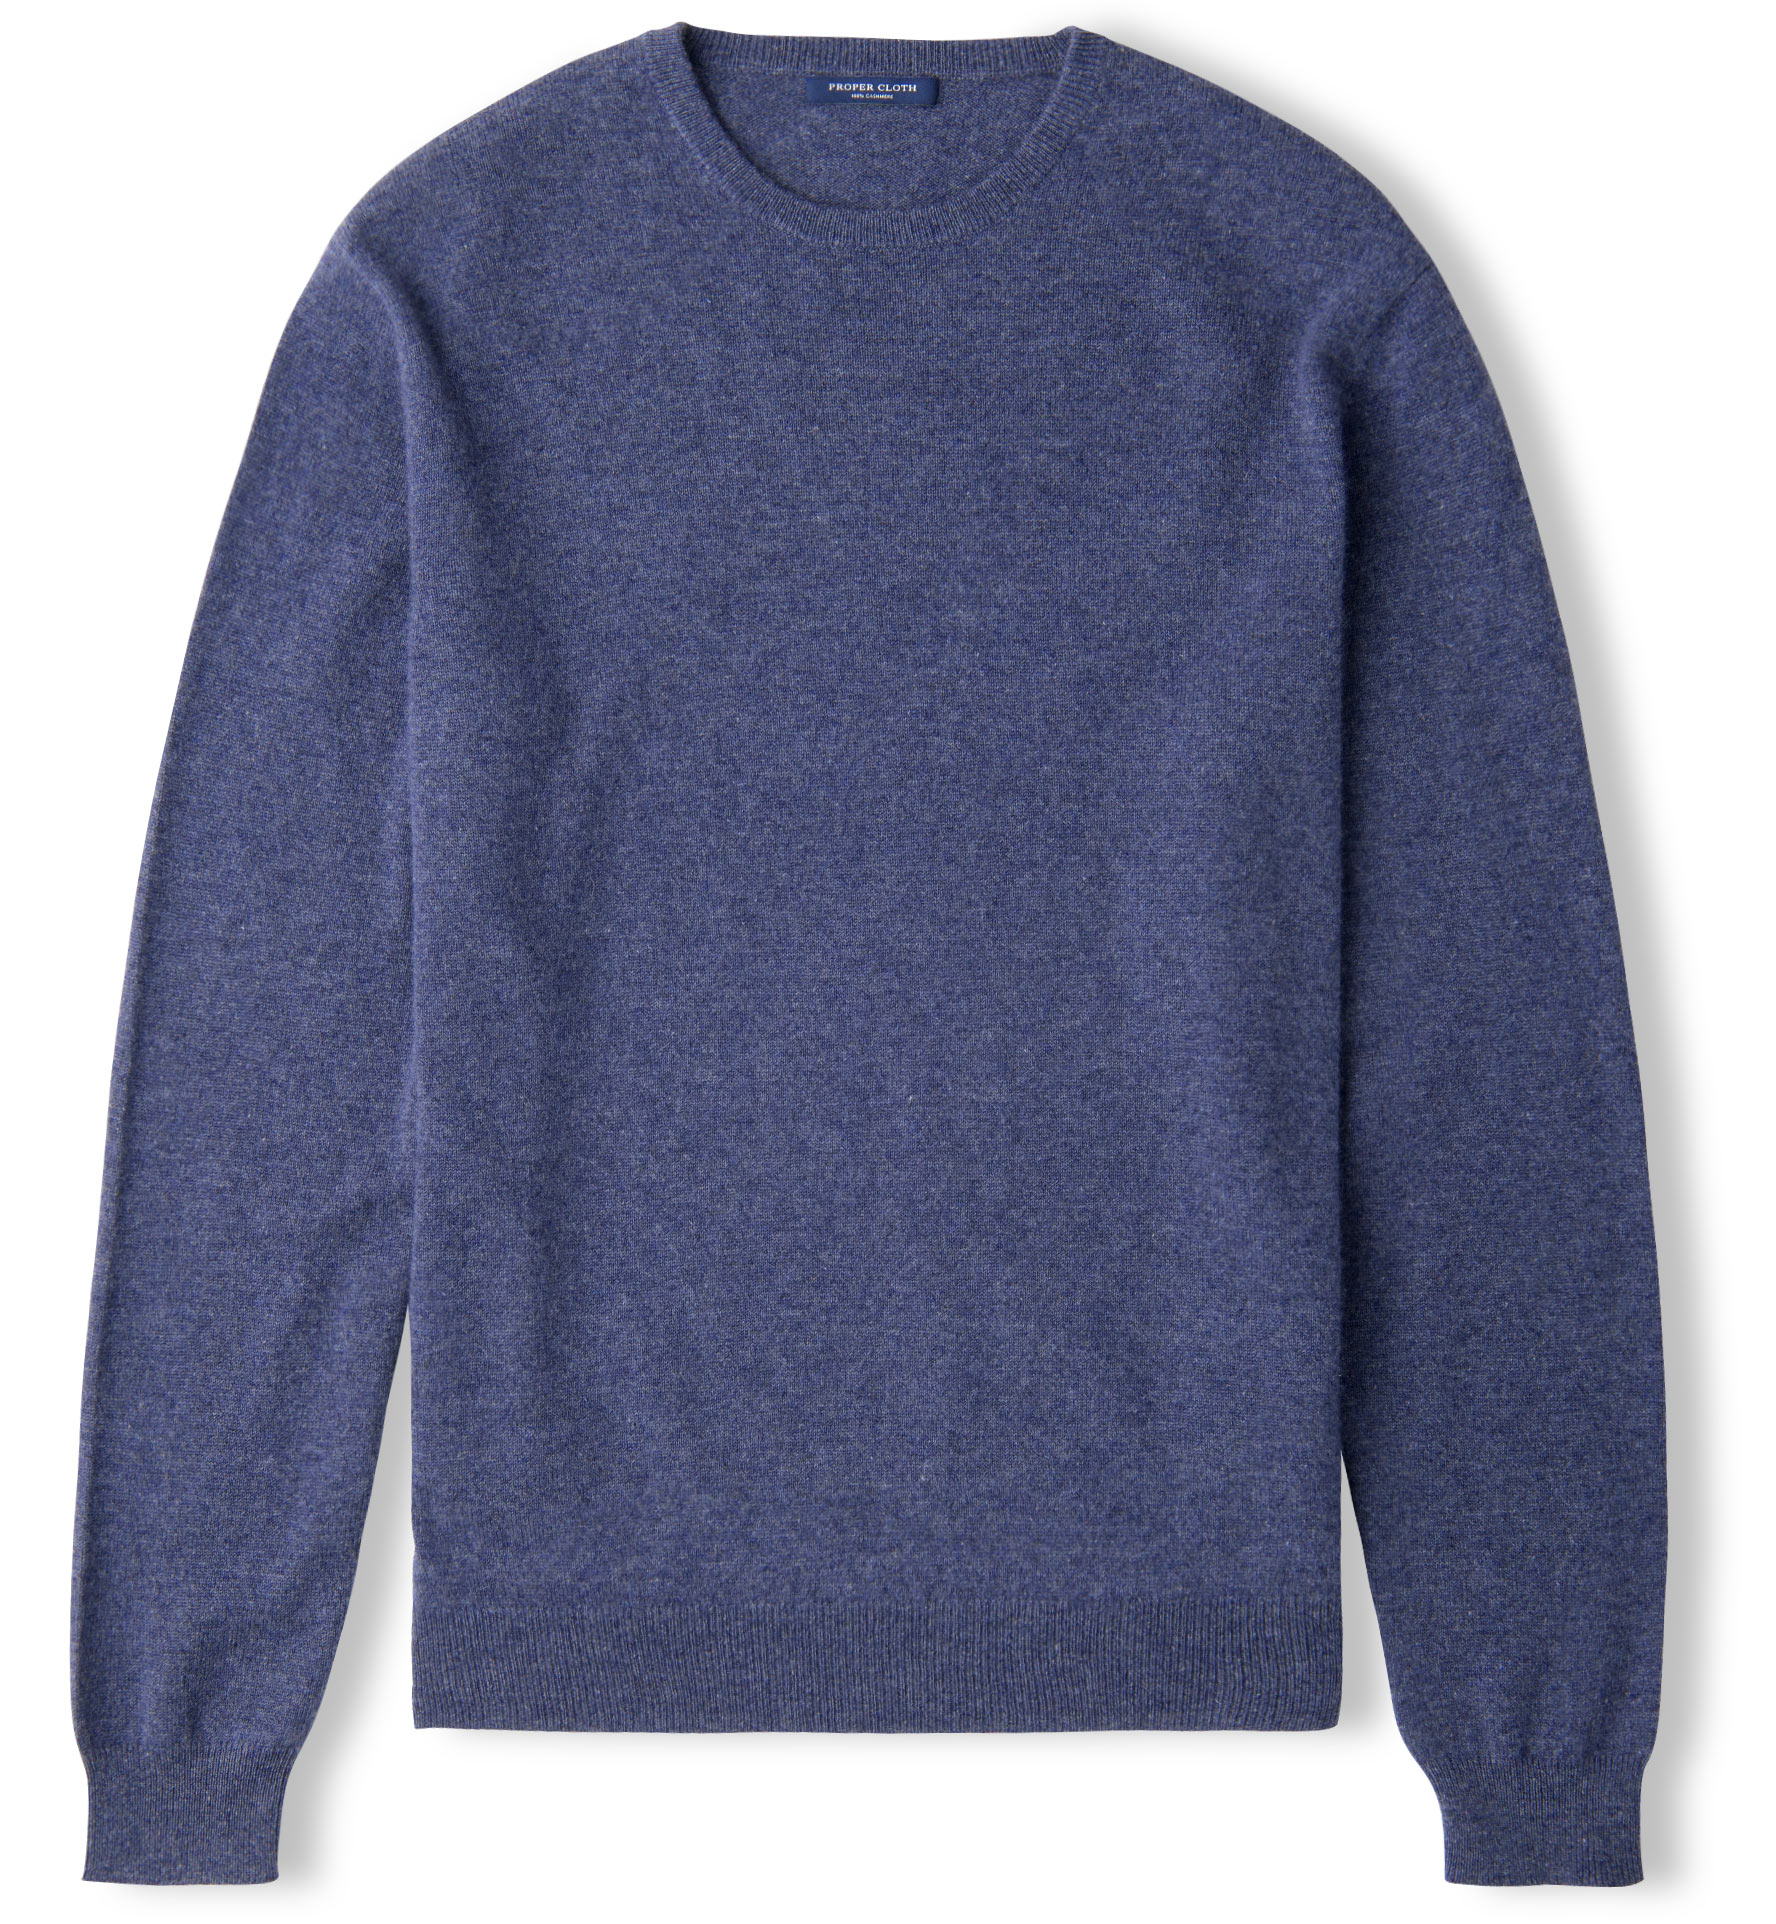 Zoom Image of Slate Blue Cashmere Crewneck Sweater